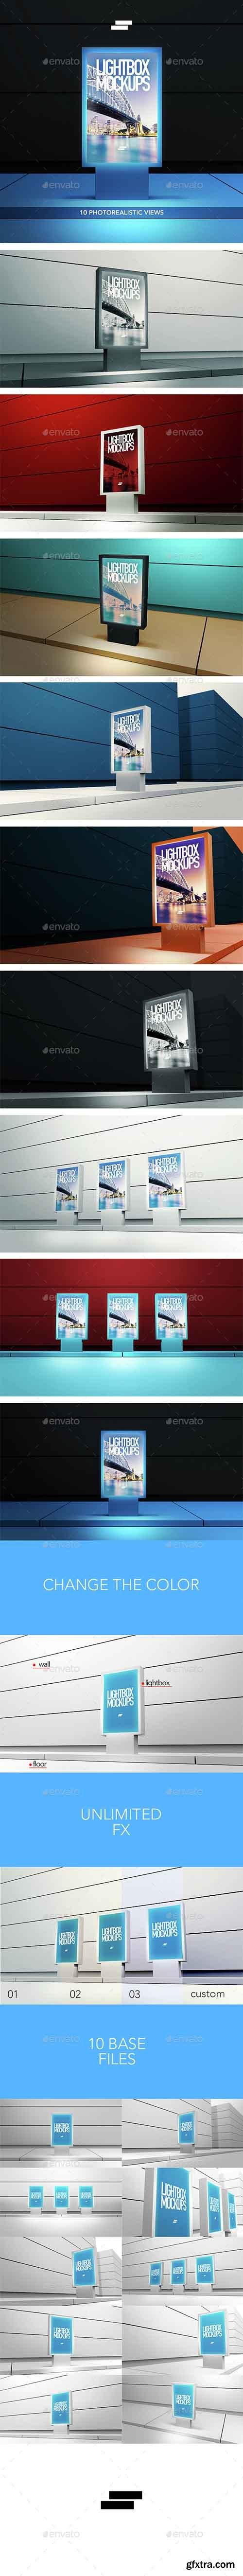 3D Lightbox Poster Outdoor Mock-ups 15128046